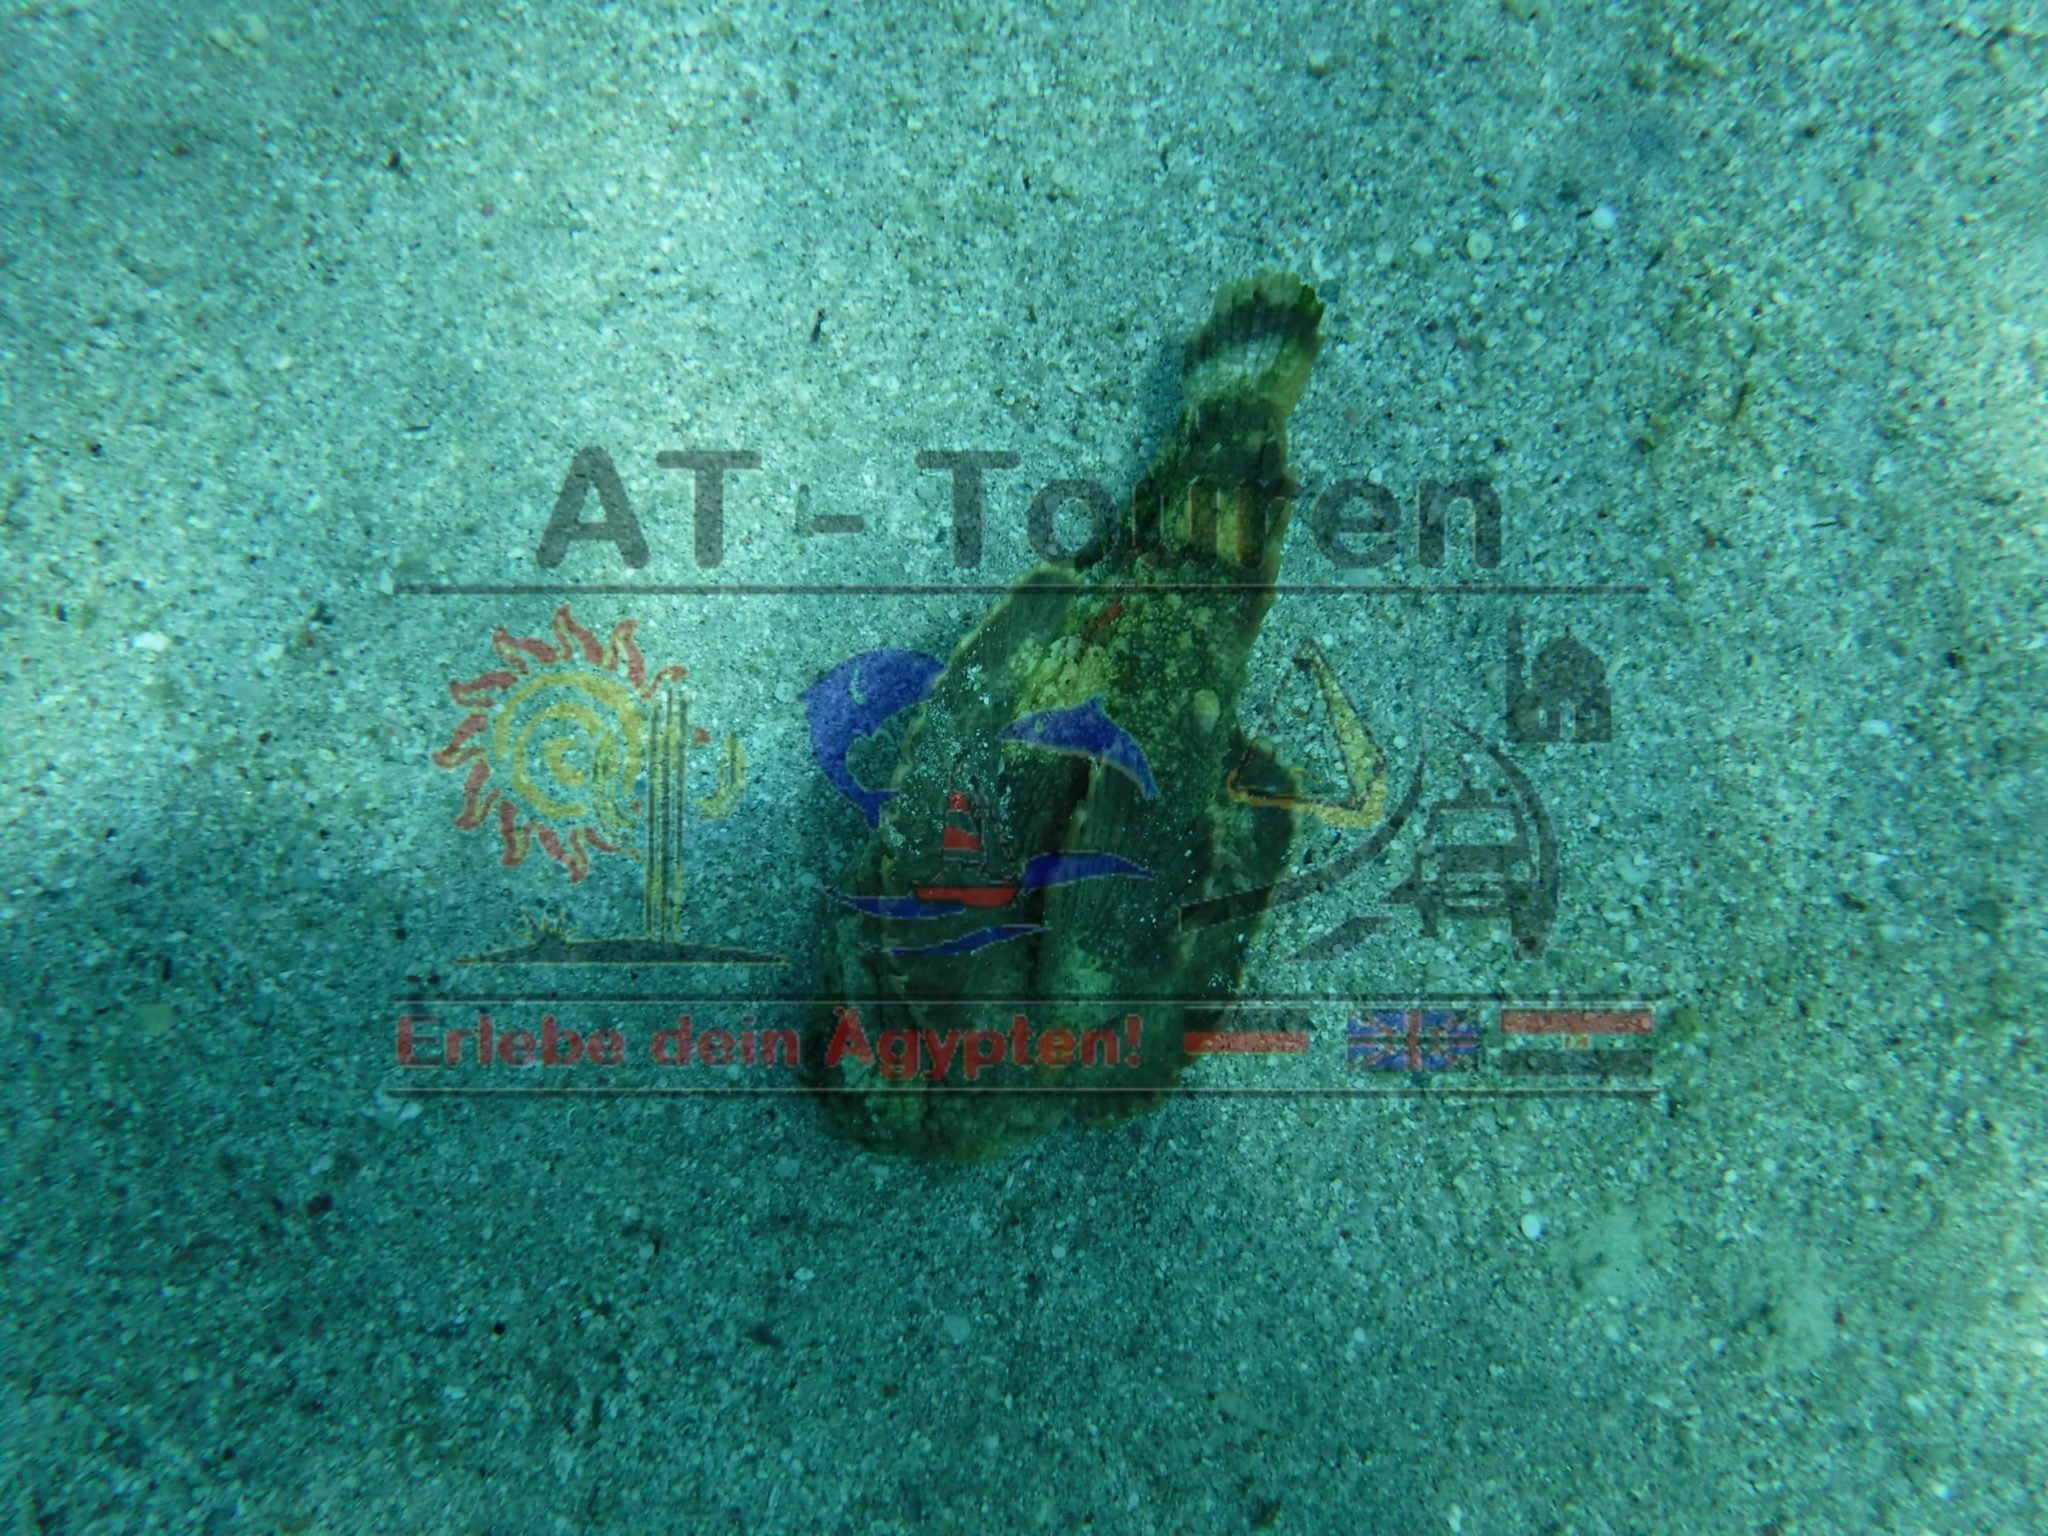 Marsa_Alam_Abu_dabbab_Schildkröten_Tour_AT_Touren_Hurghada_6__at-touren.de-min